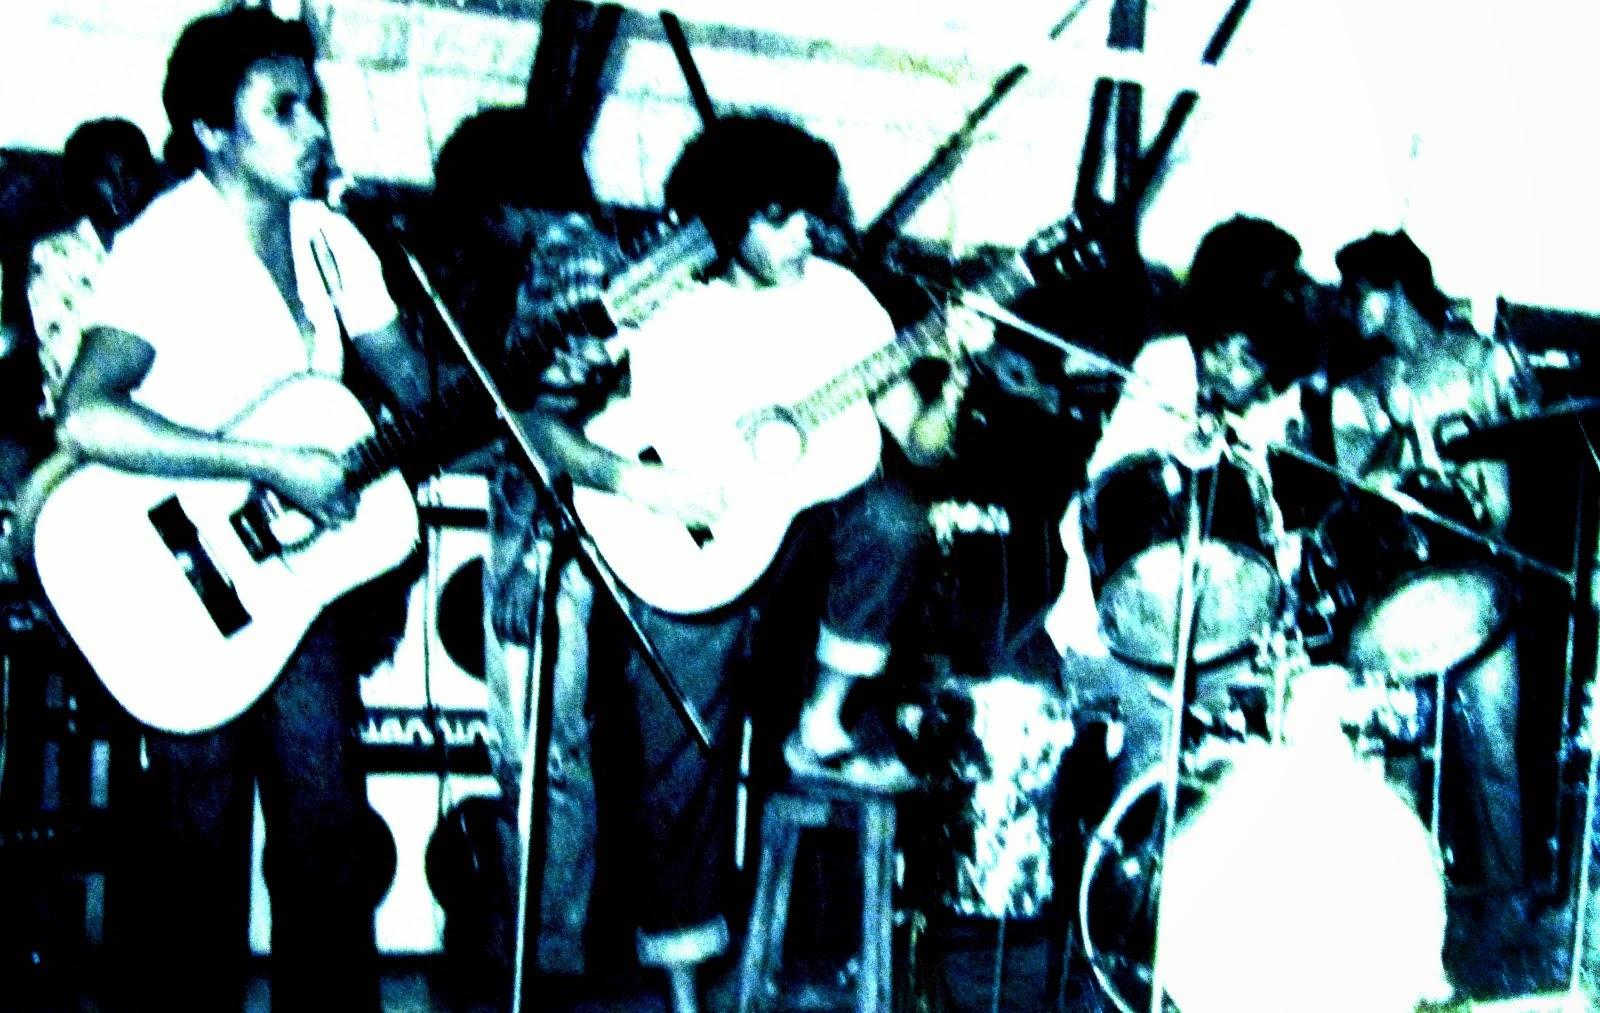 Festival no Loyola-Gil,Carlos,Jhonathas